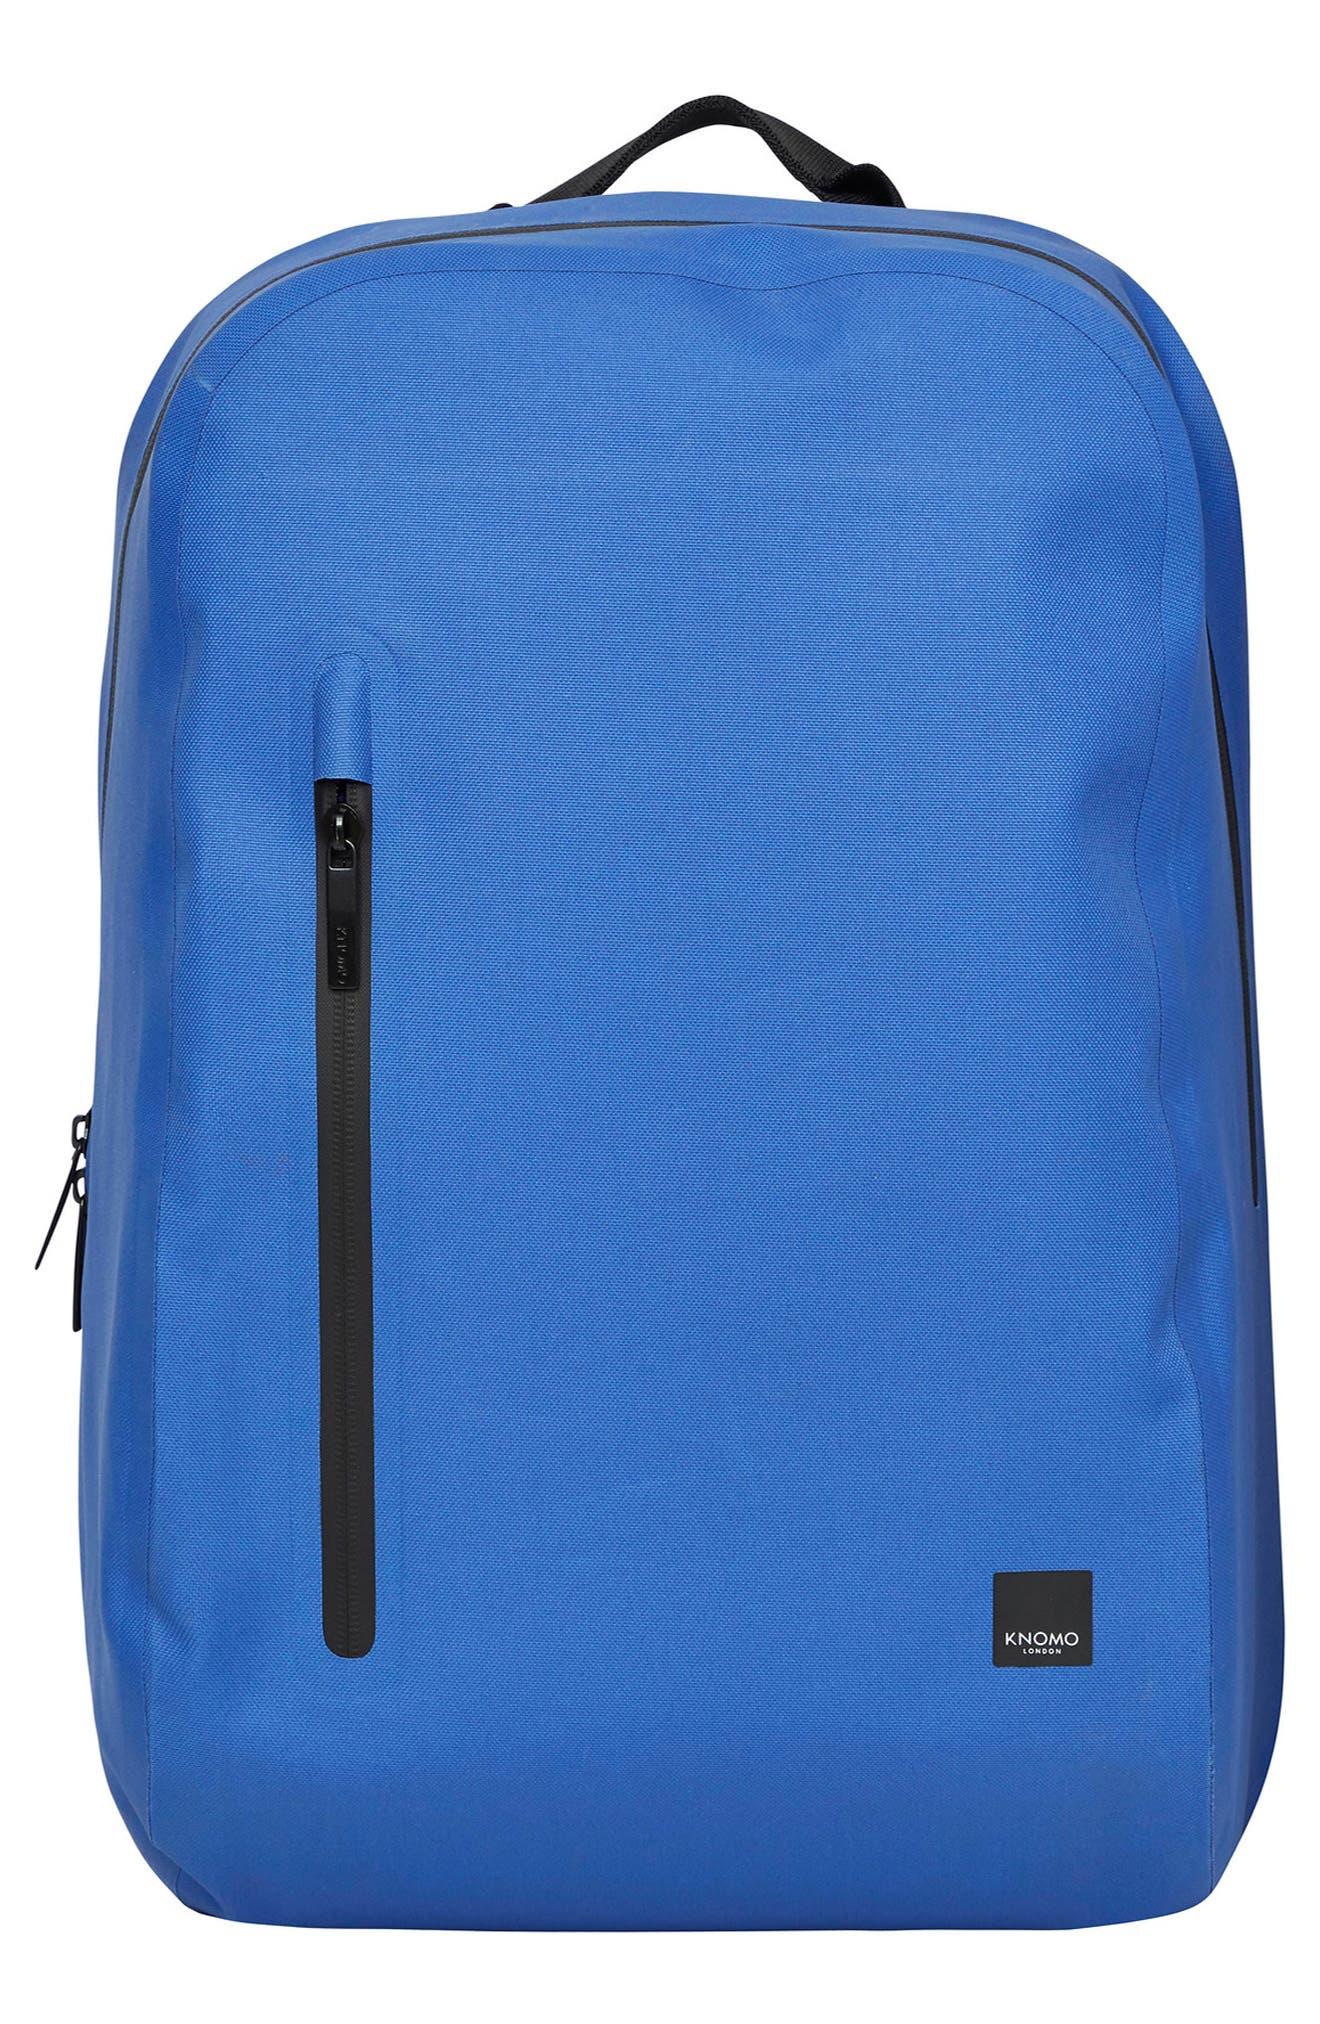 KNOMO LONDON Thames Harpsden Backpack, Main, color, AZURE BLUE